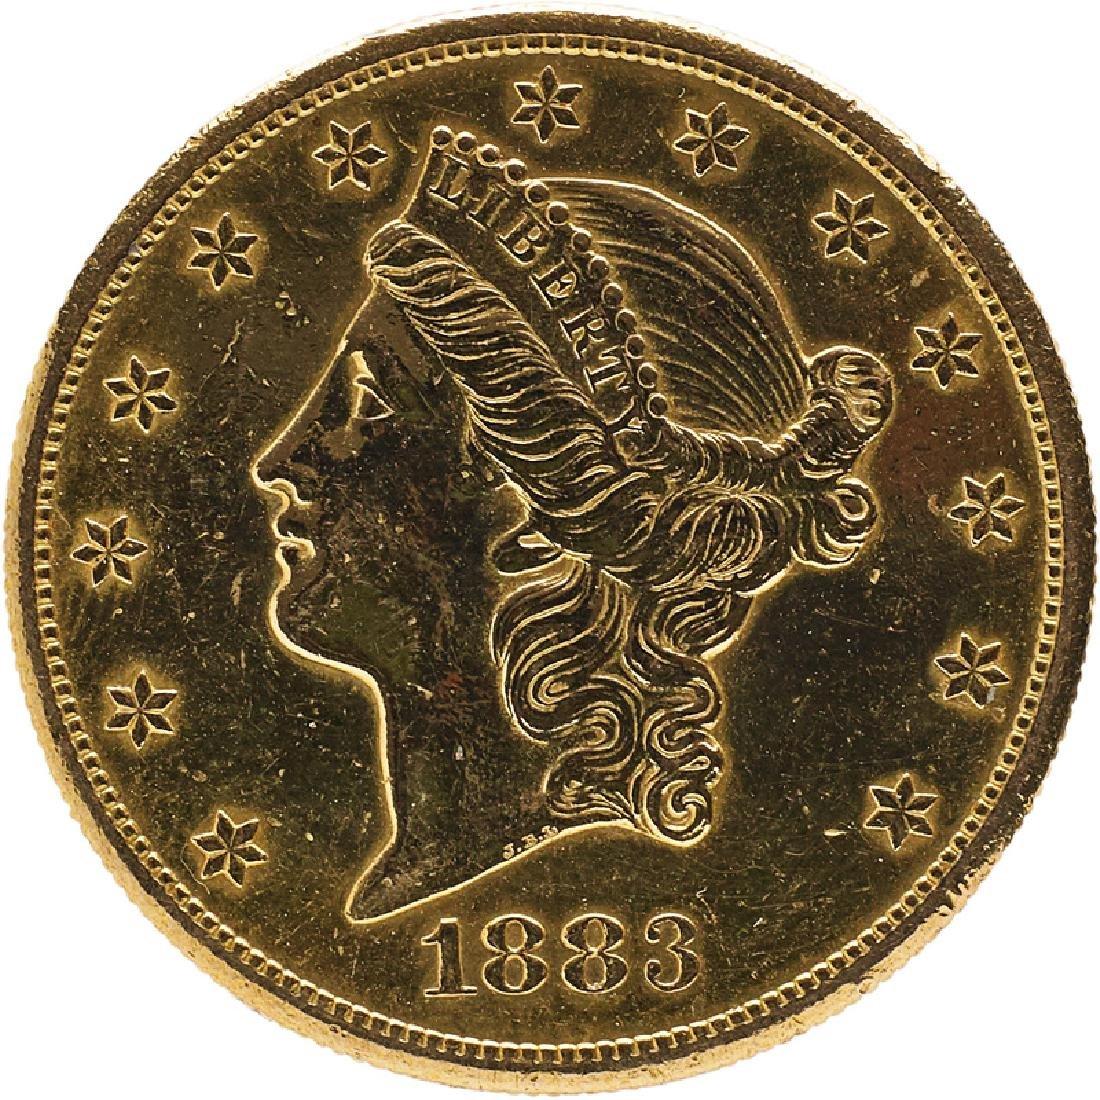 U.S. 1883-S LIBERTY $20 GOLD COIN